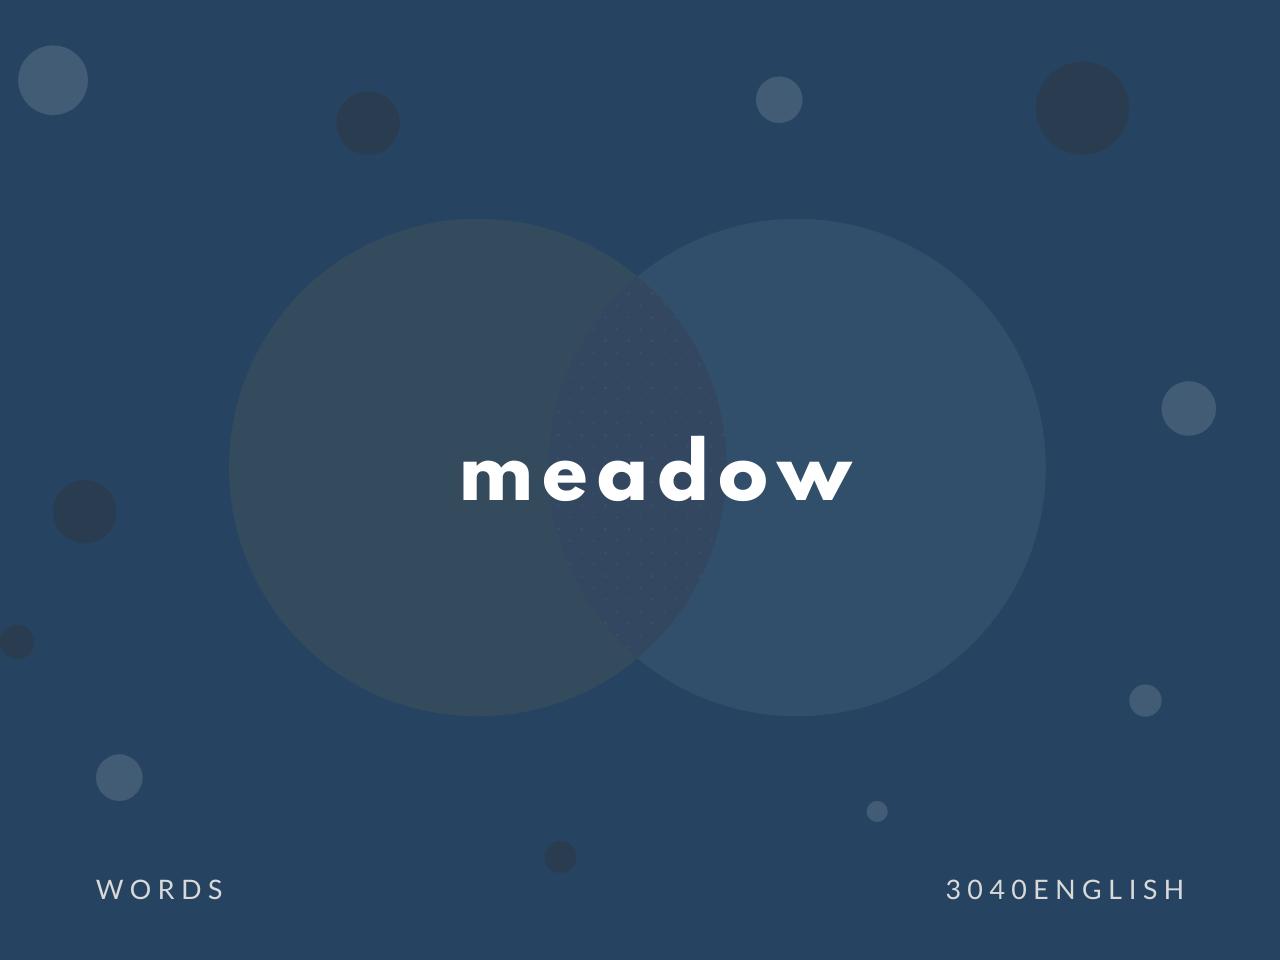 meadow の意味と簡単な使い方【音読用例文あり】